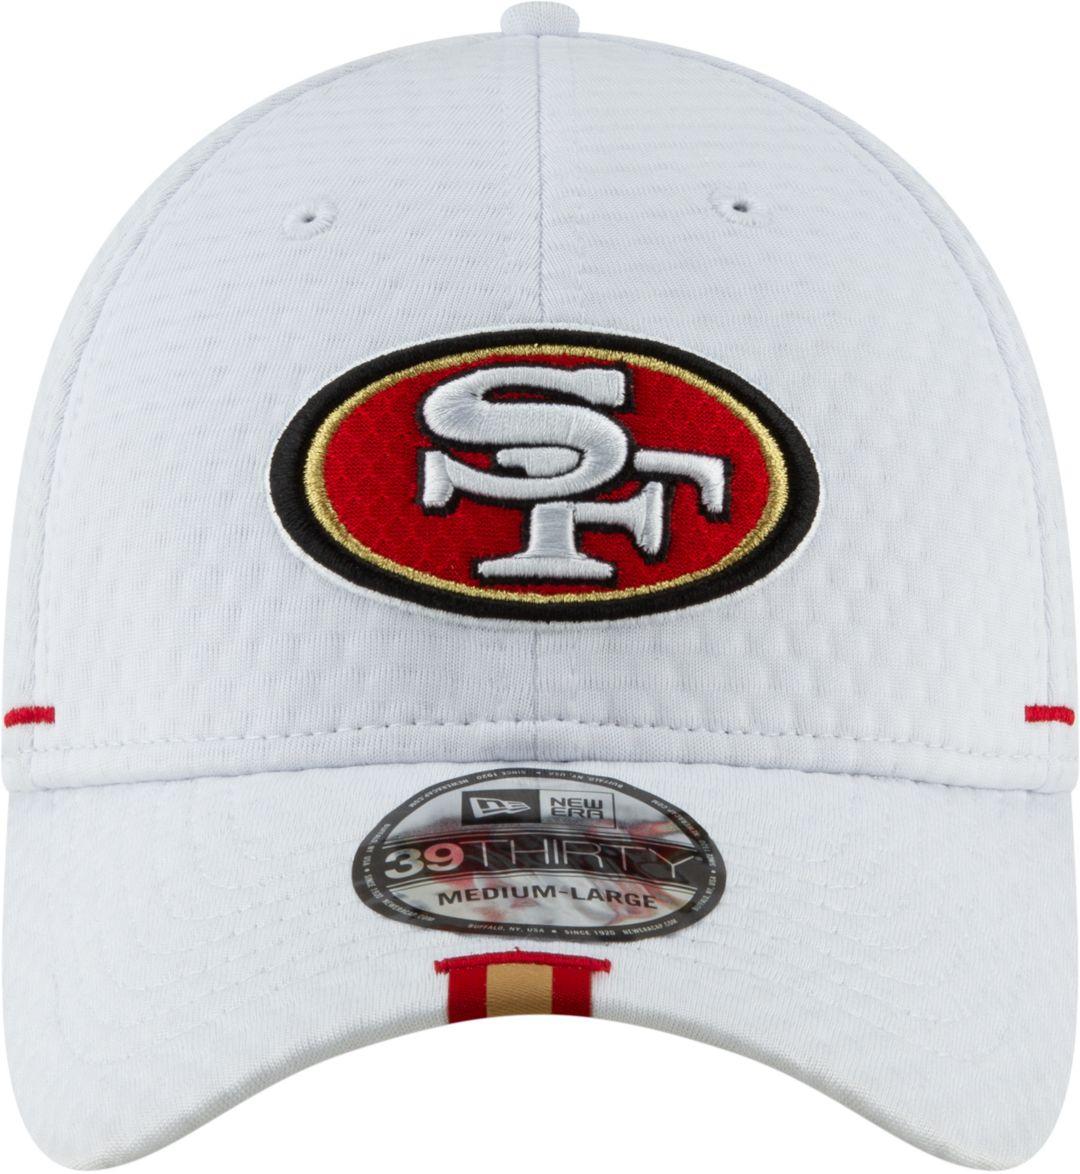 c72c2329e New Era Men's San Francisco 49ers Sideline Training Camp 39Thirty Stretch  Fit White Hat